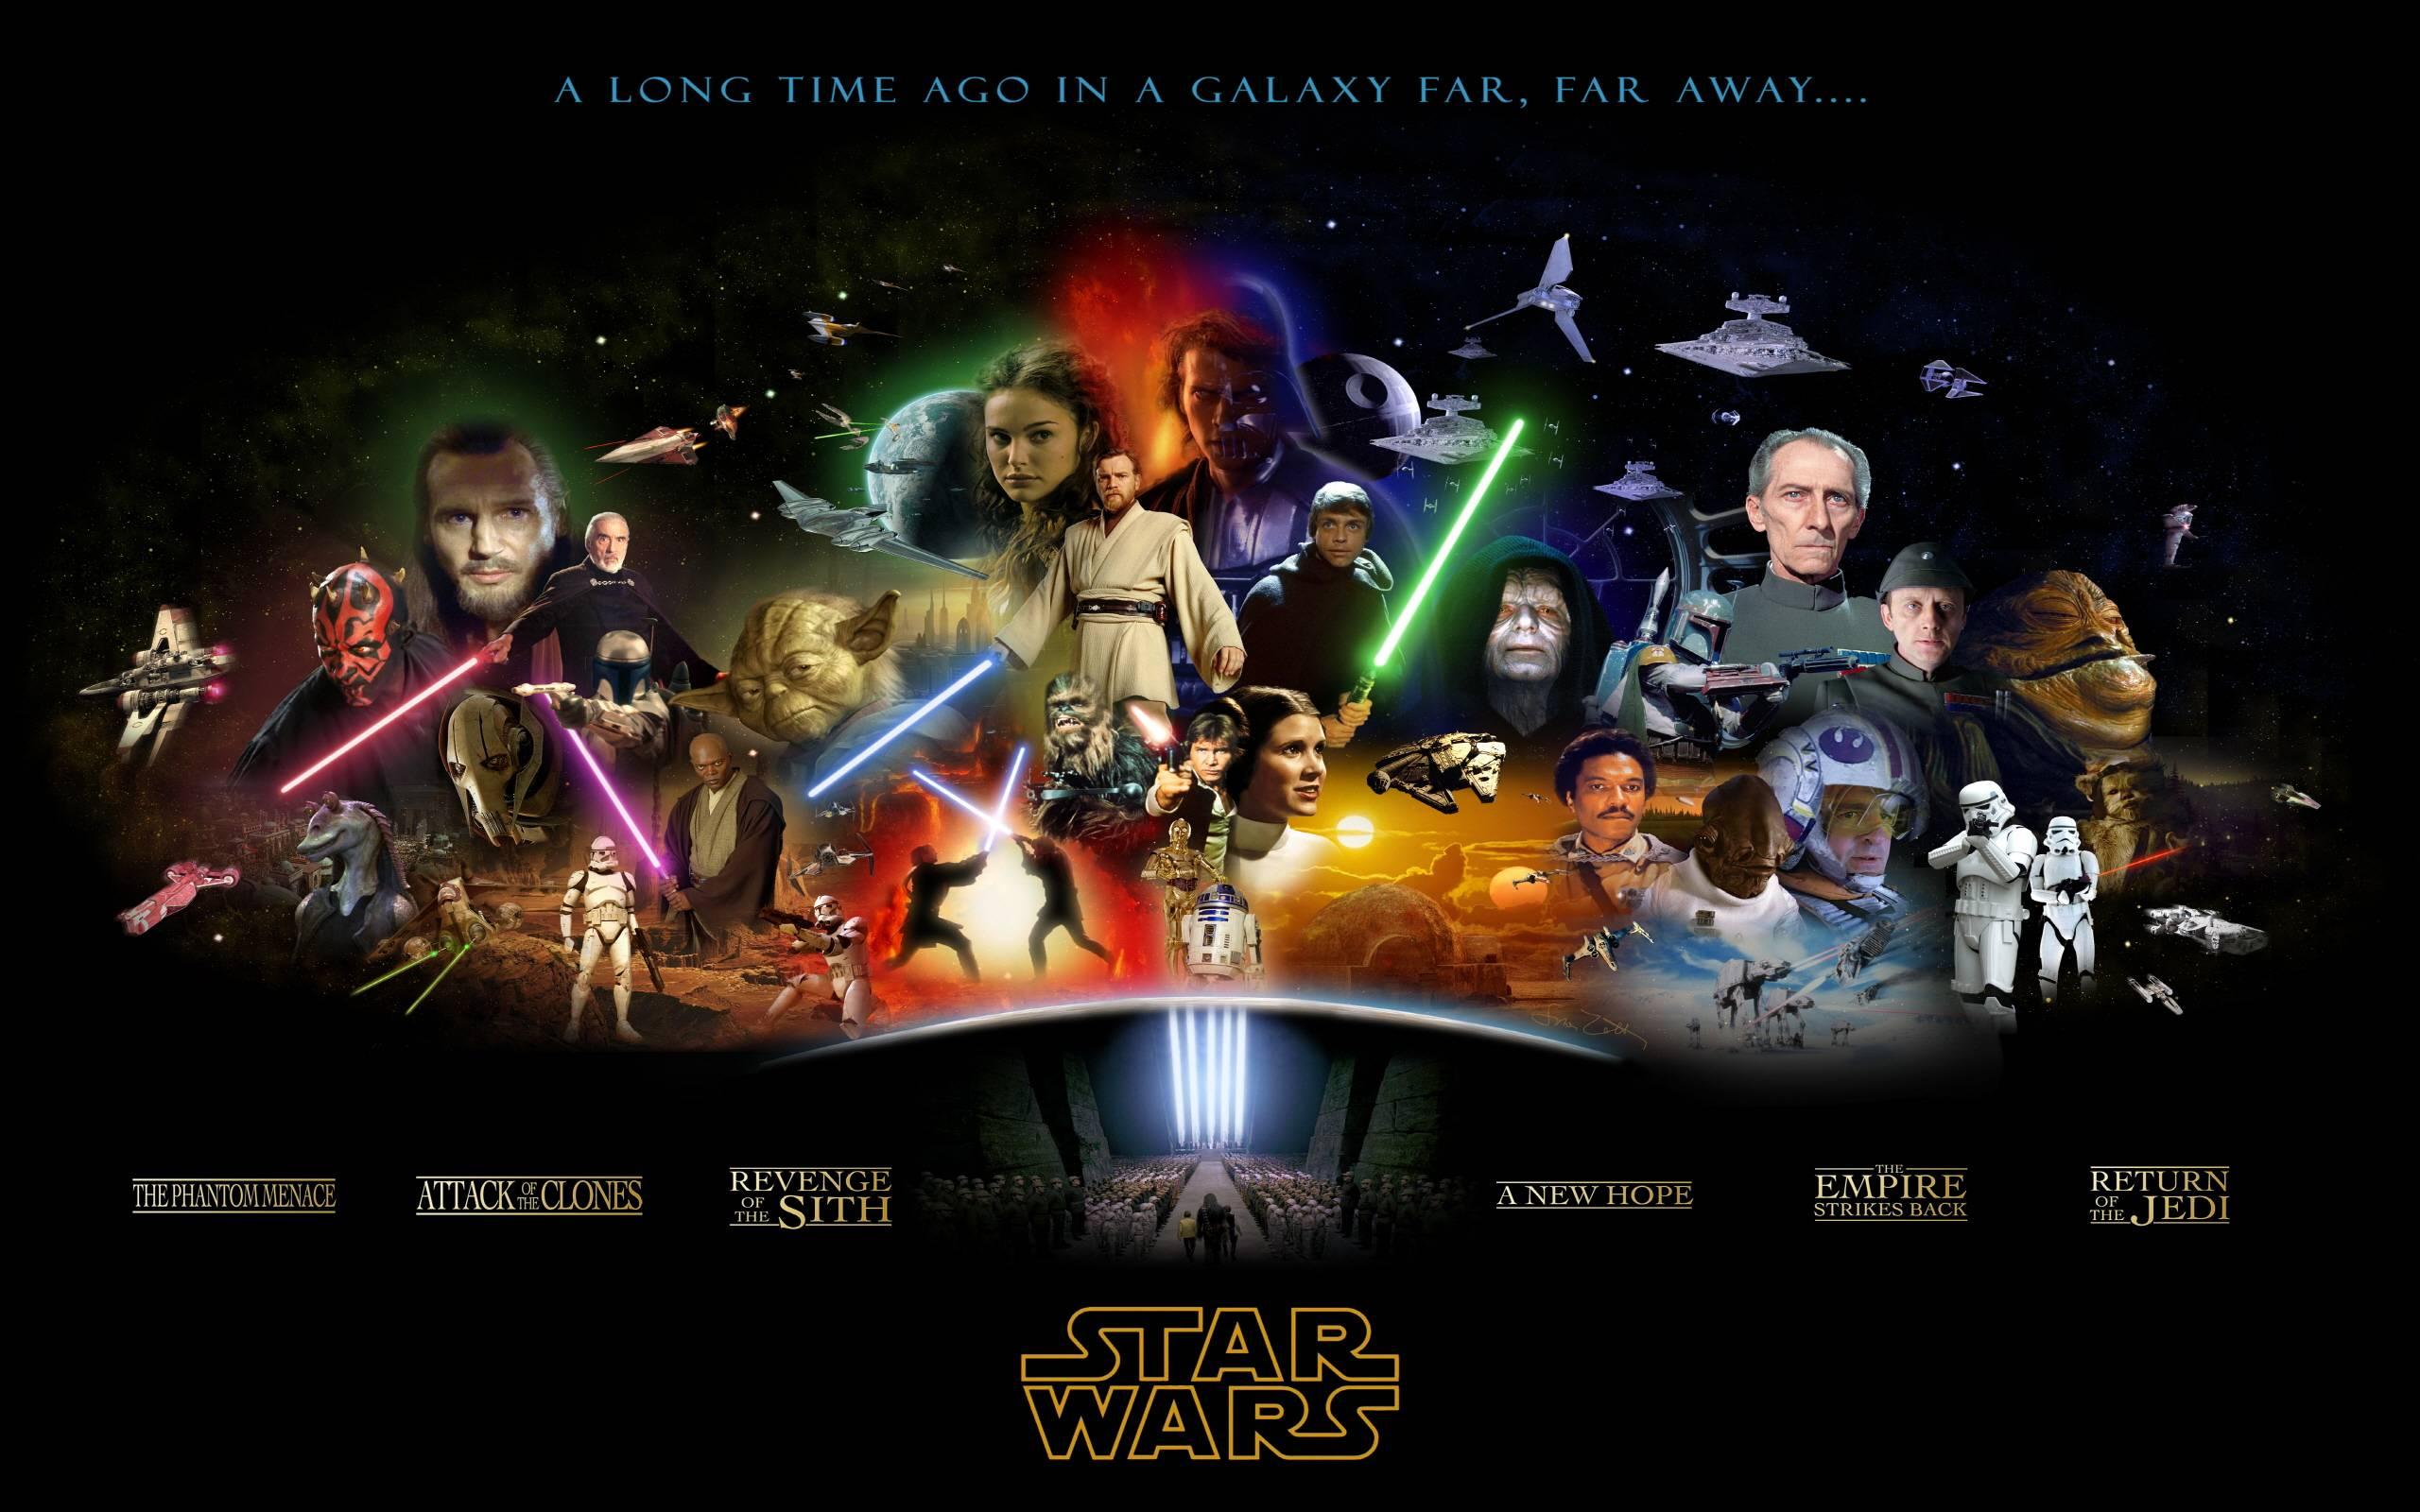 HD Star Wars Wallpapers - Wallpaper Cave